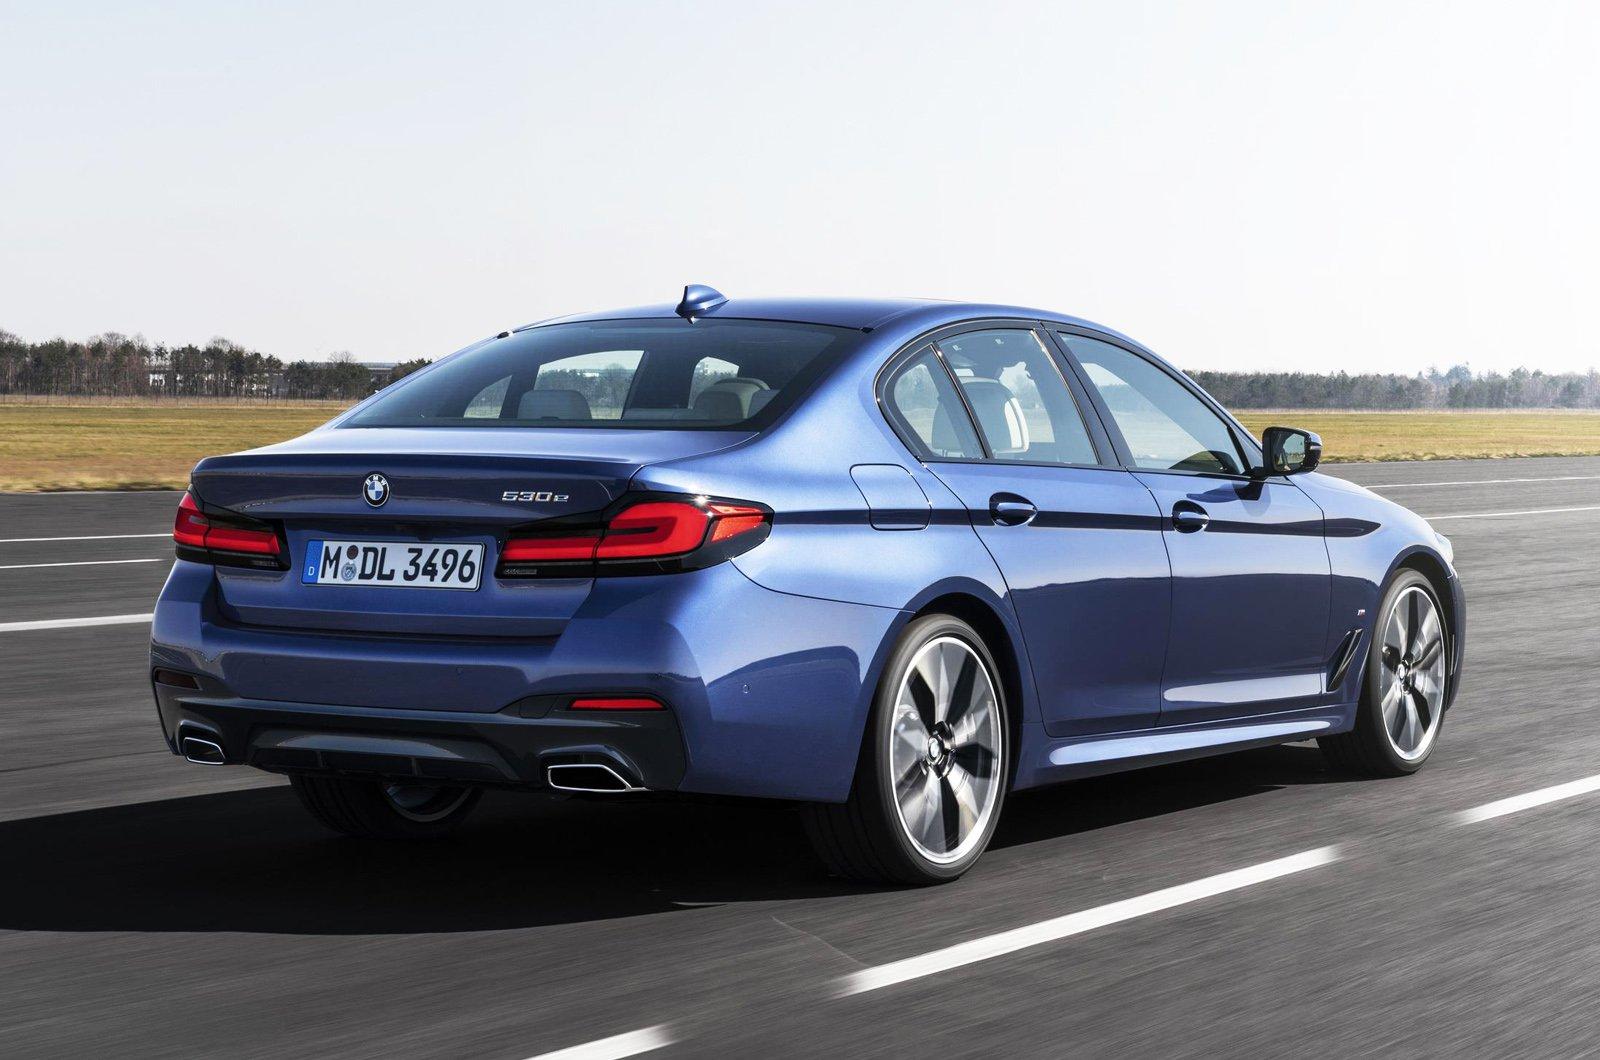 2021 BMW 5 Series saloon rear tracking - German plate